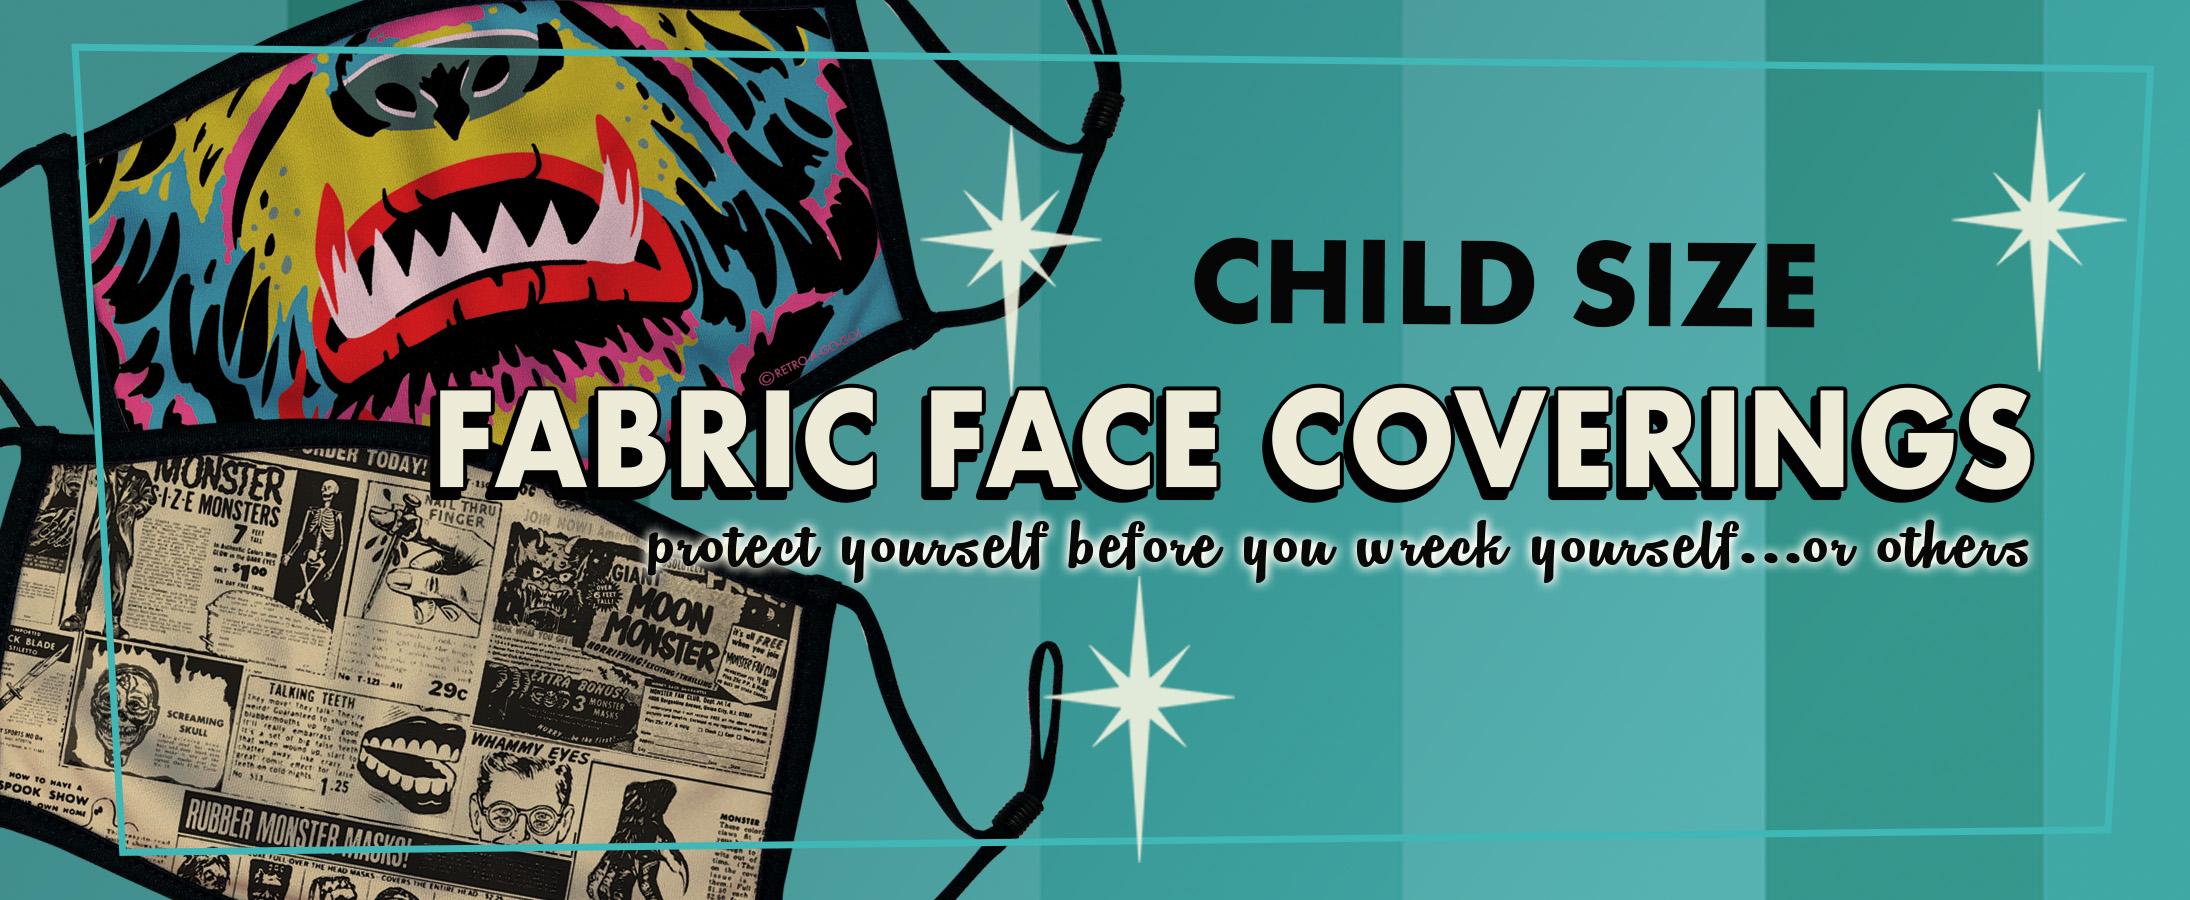 rev-child-facemask-header-2.jpg